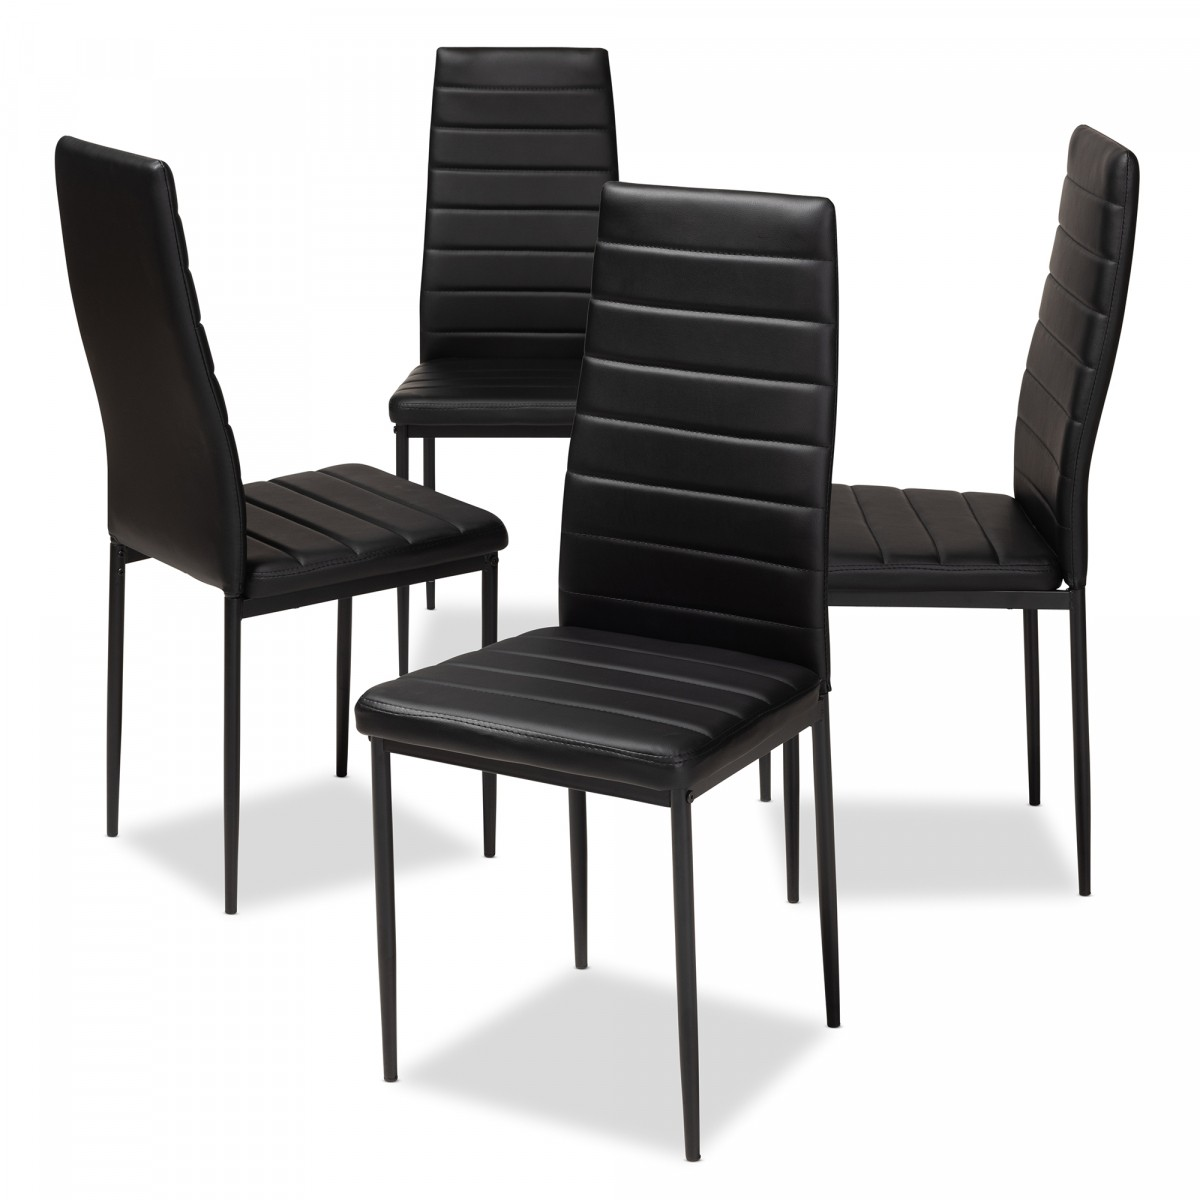 Cheap Black Dining Chairs: Baxton Studio Armand Modern & Contemporary Black Faux